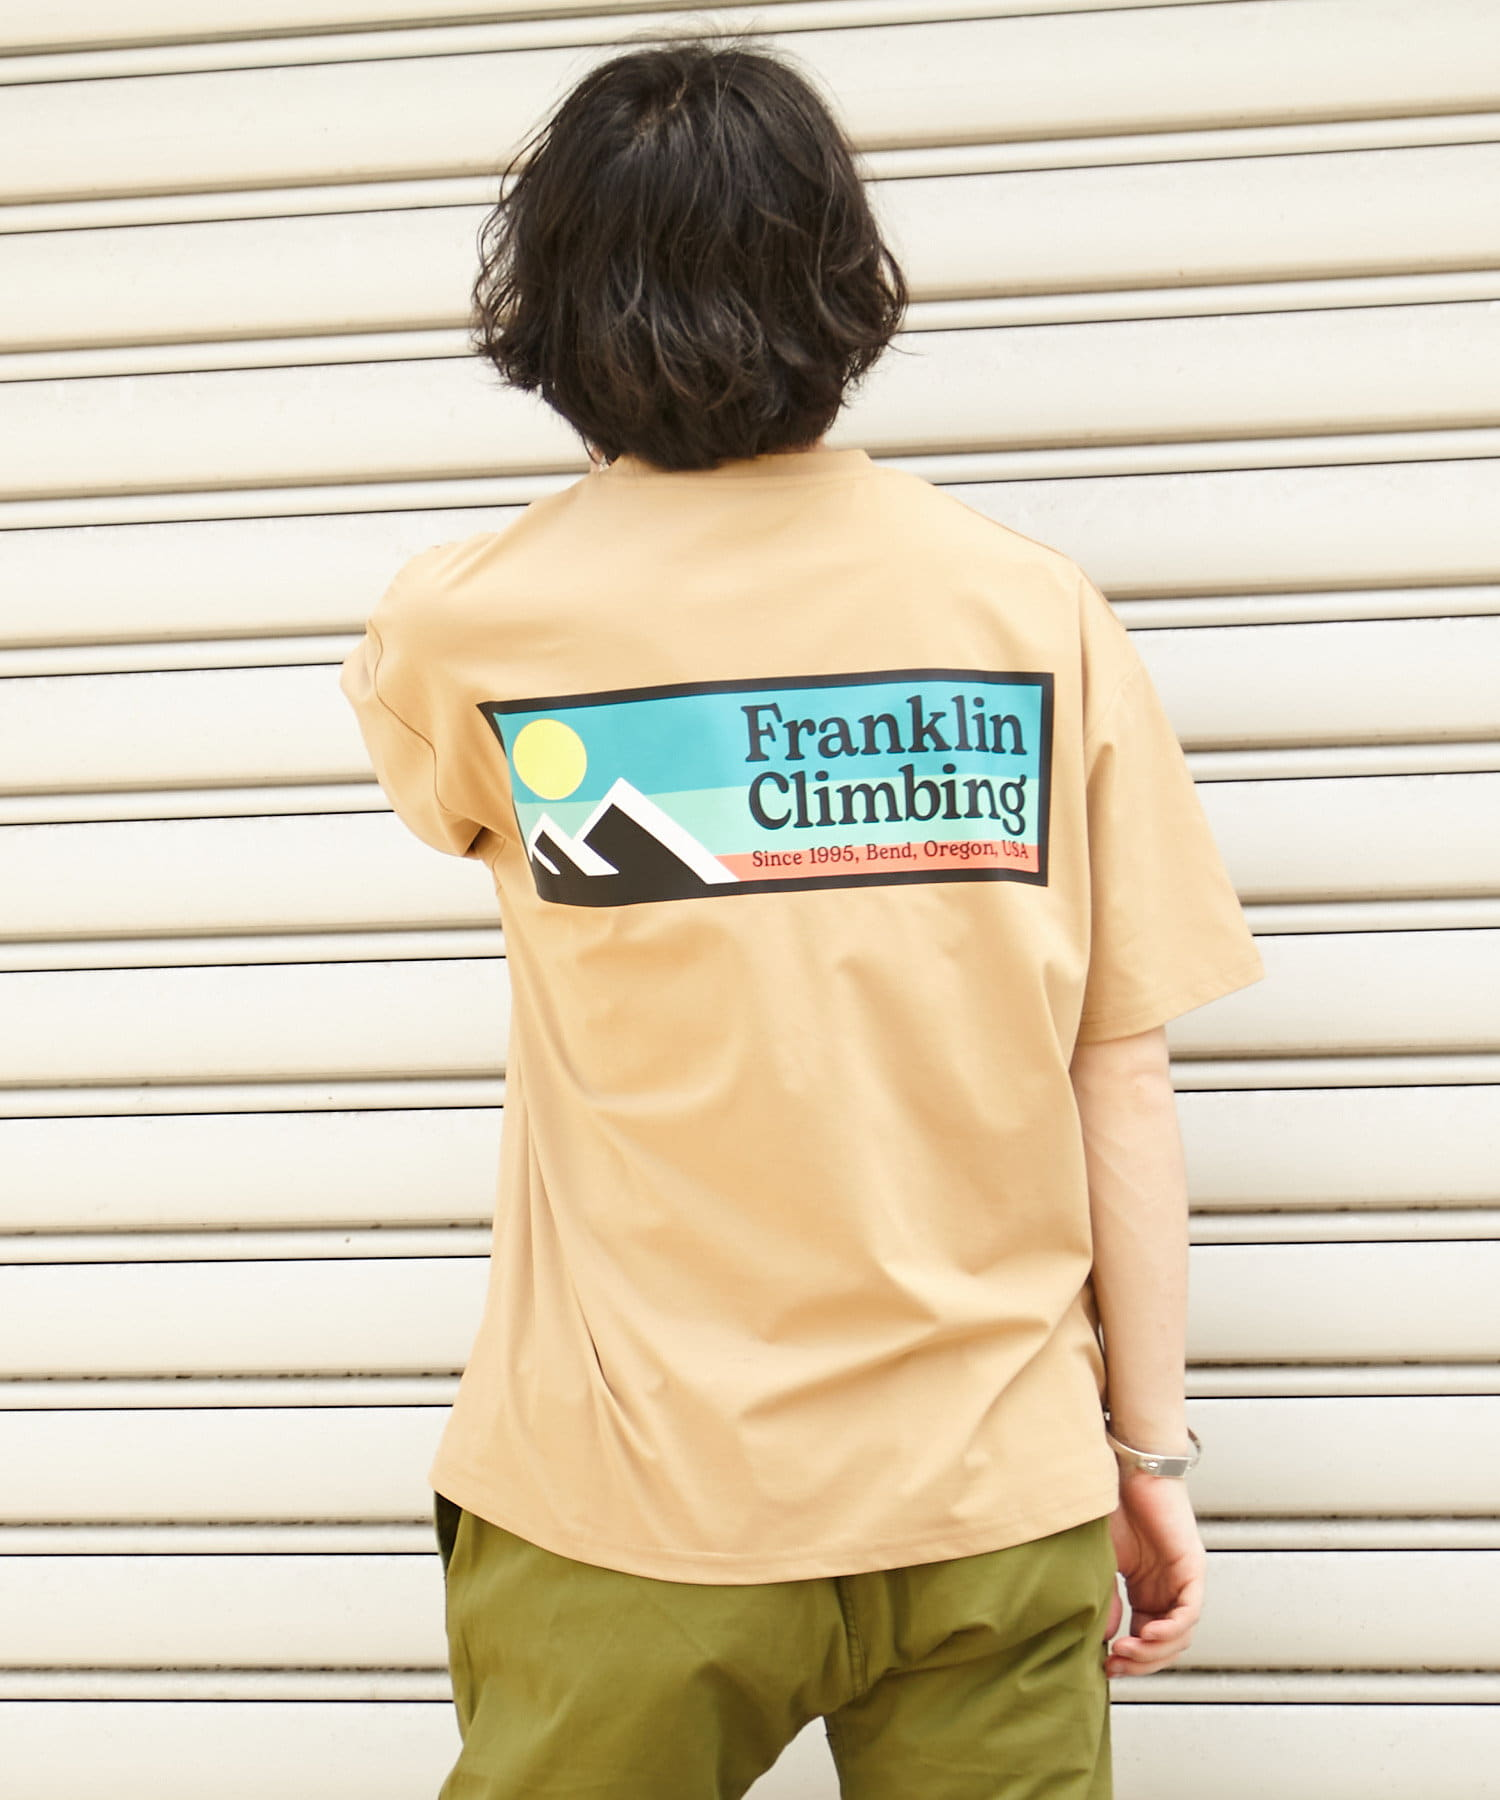 CIAOPANIC TYPY(チャオパニックティピー) 【サイズ別着用動画付】【Franklin Climbing】ロゴTEE